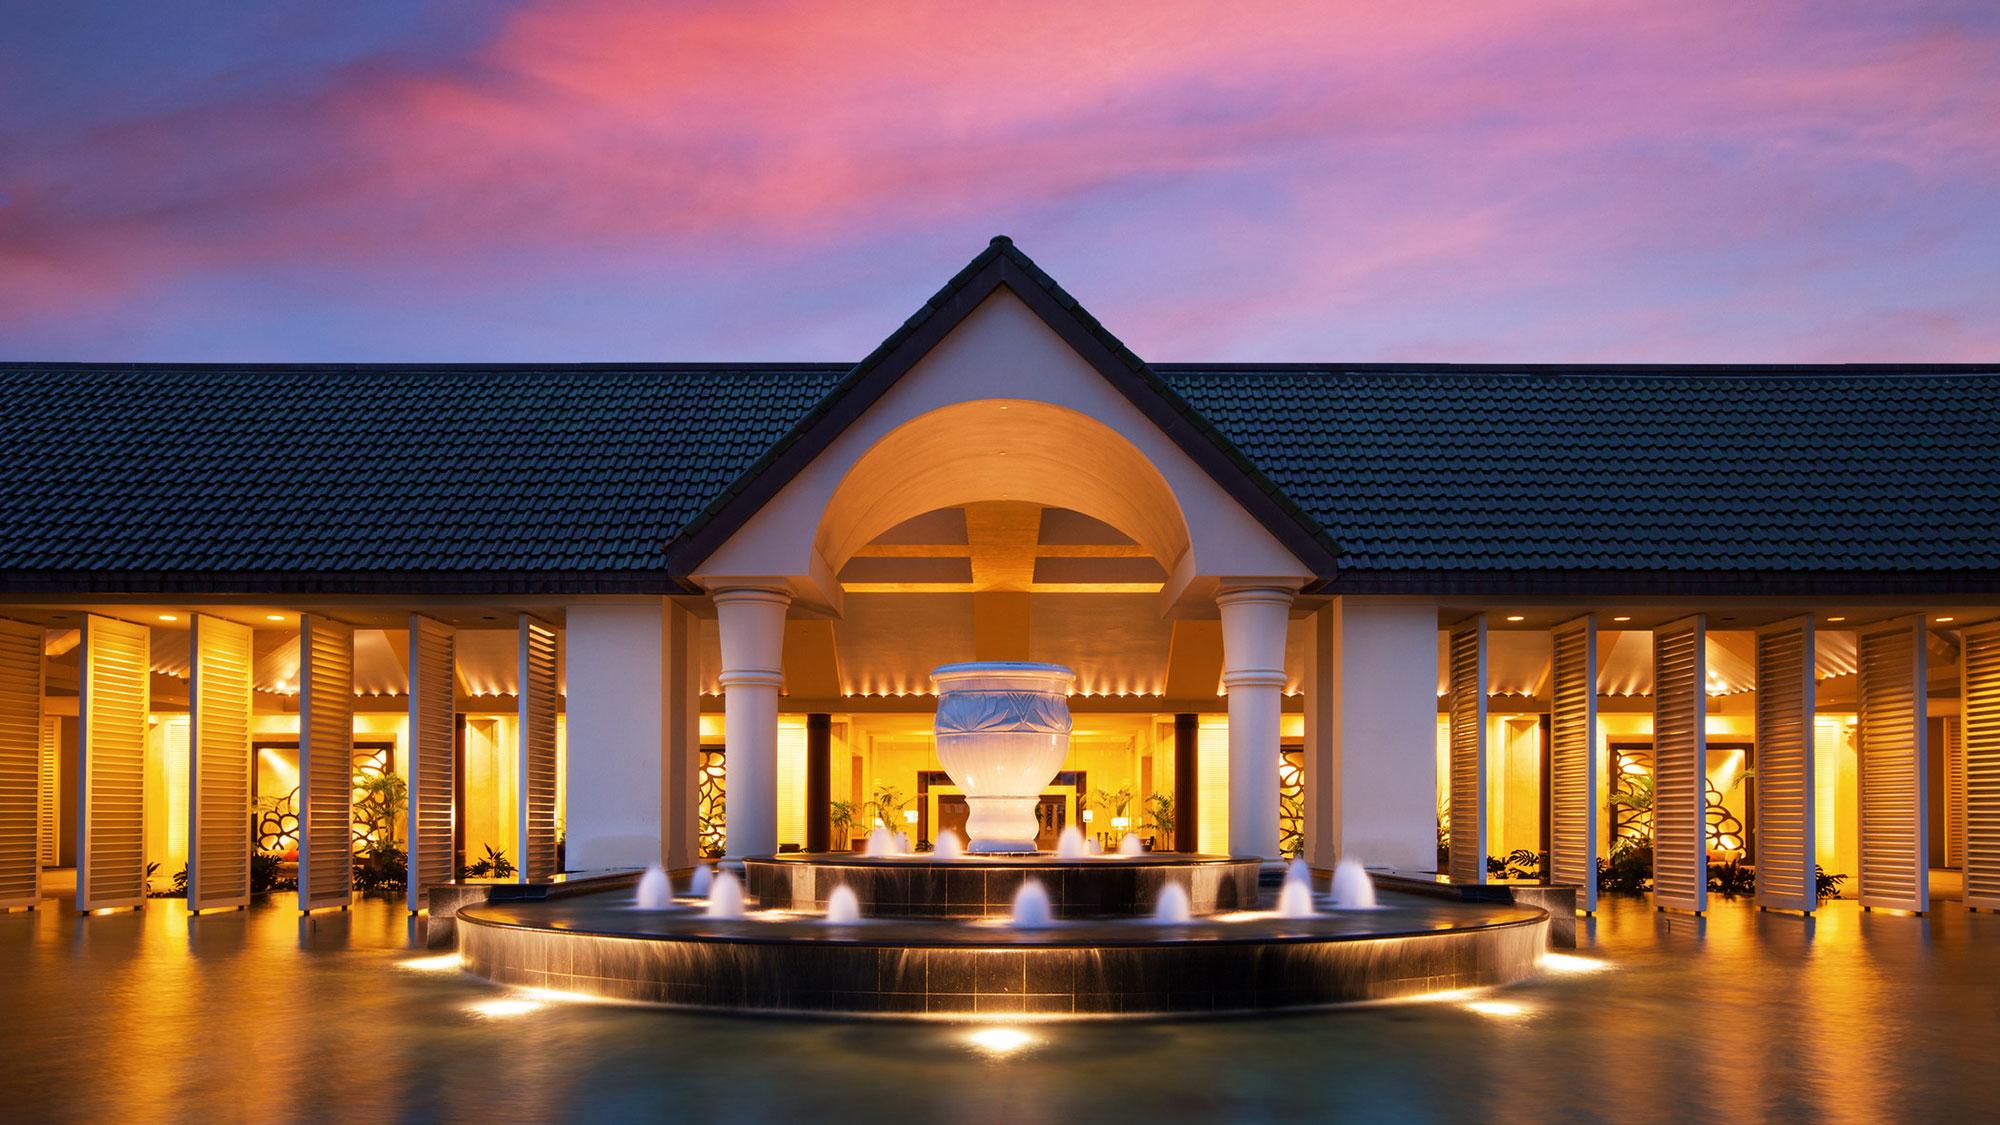 Starwood Capital buys Princeville Resort, plans 1 Hotels rebranding